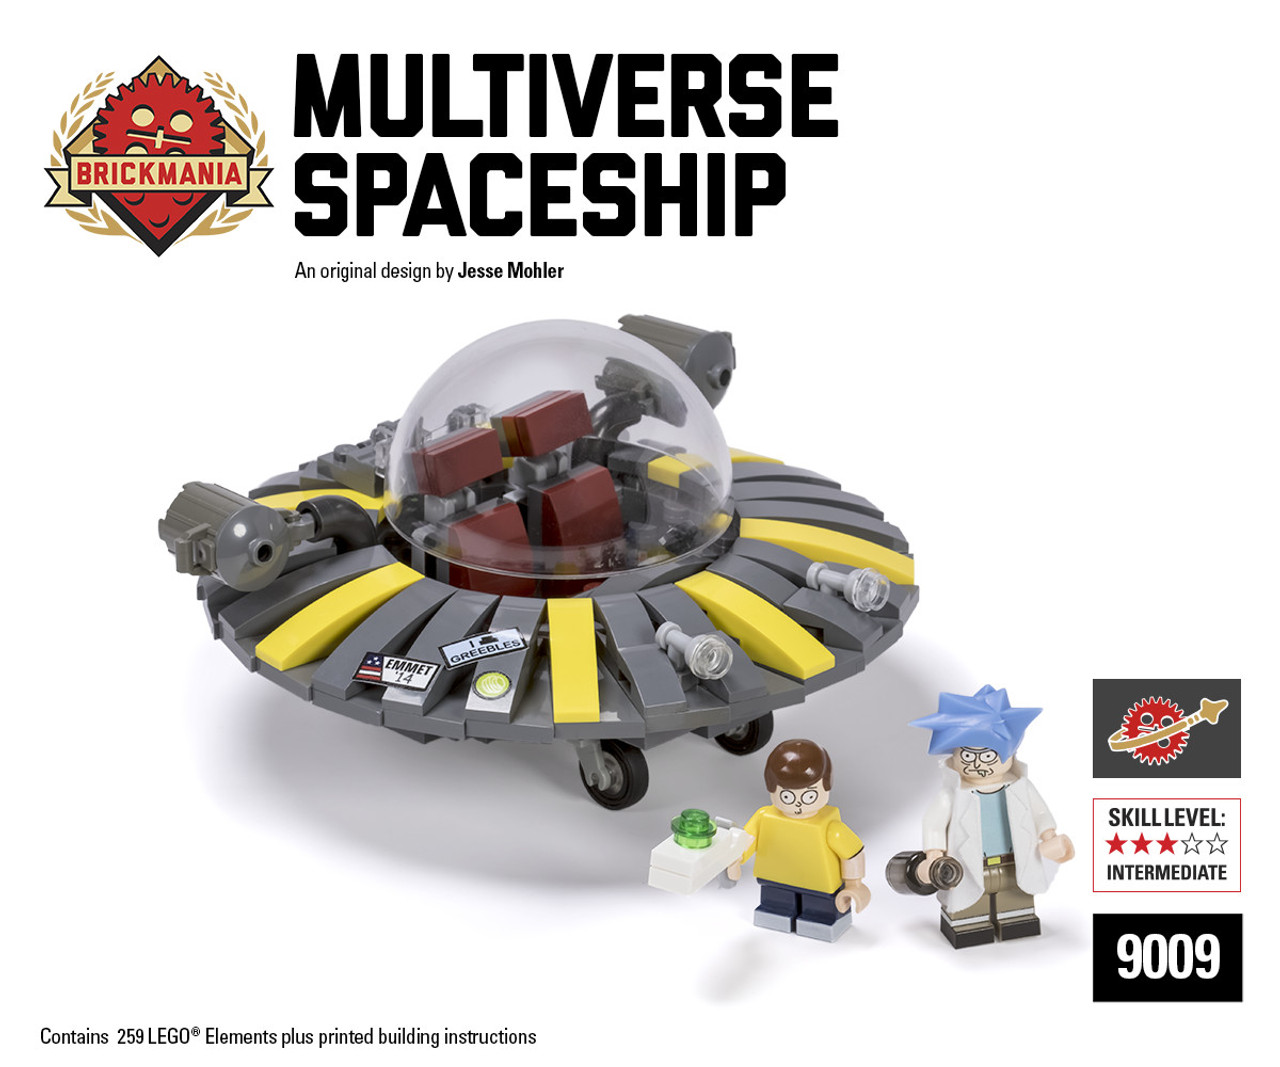 Multiverse Spaceship Brickmania Toys